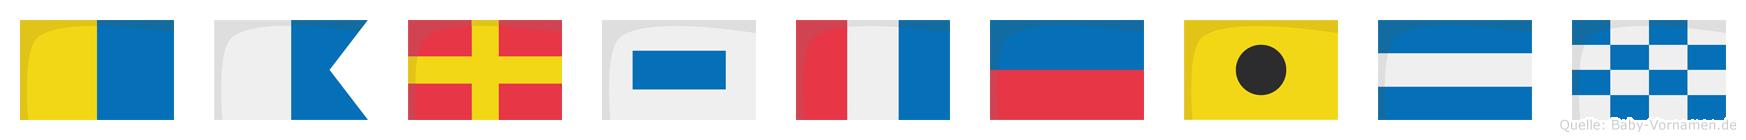 Karsteijn im Flaggenalphabet